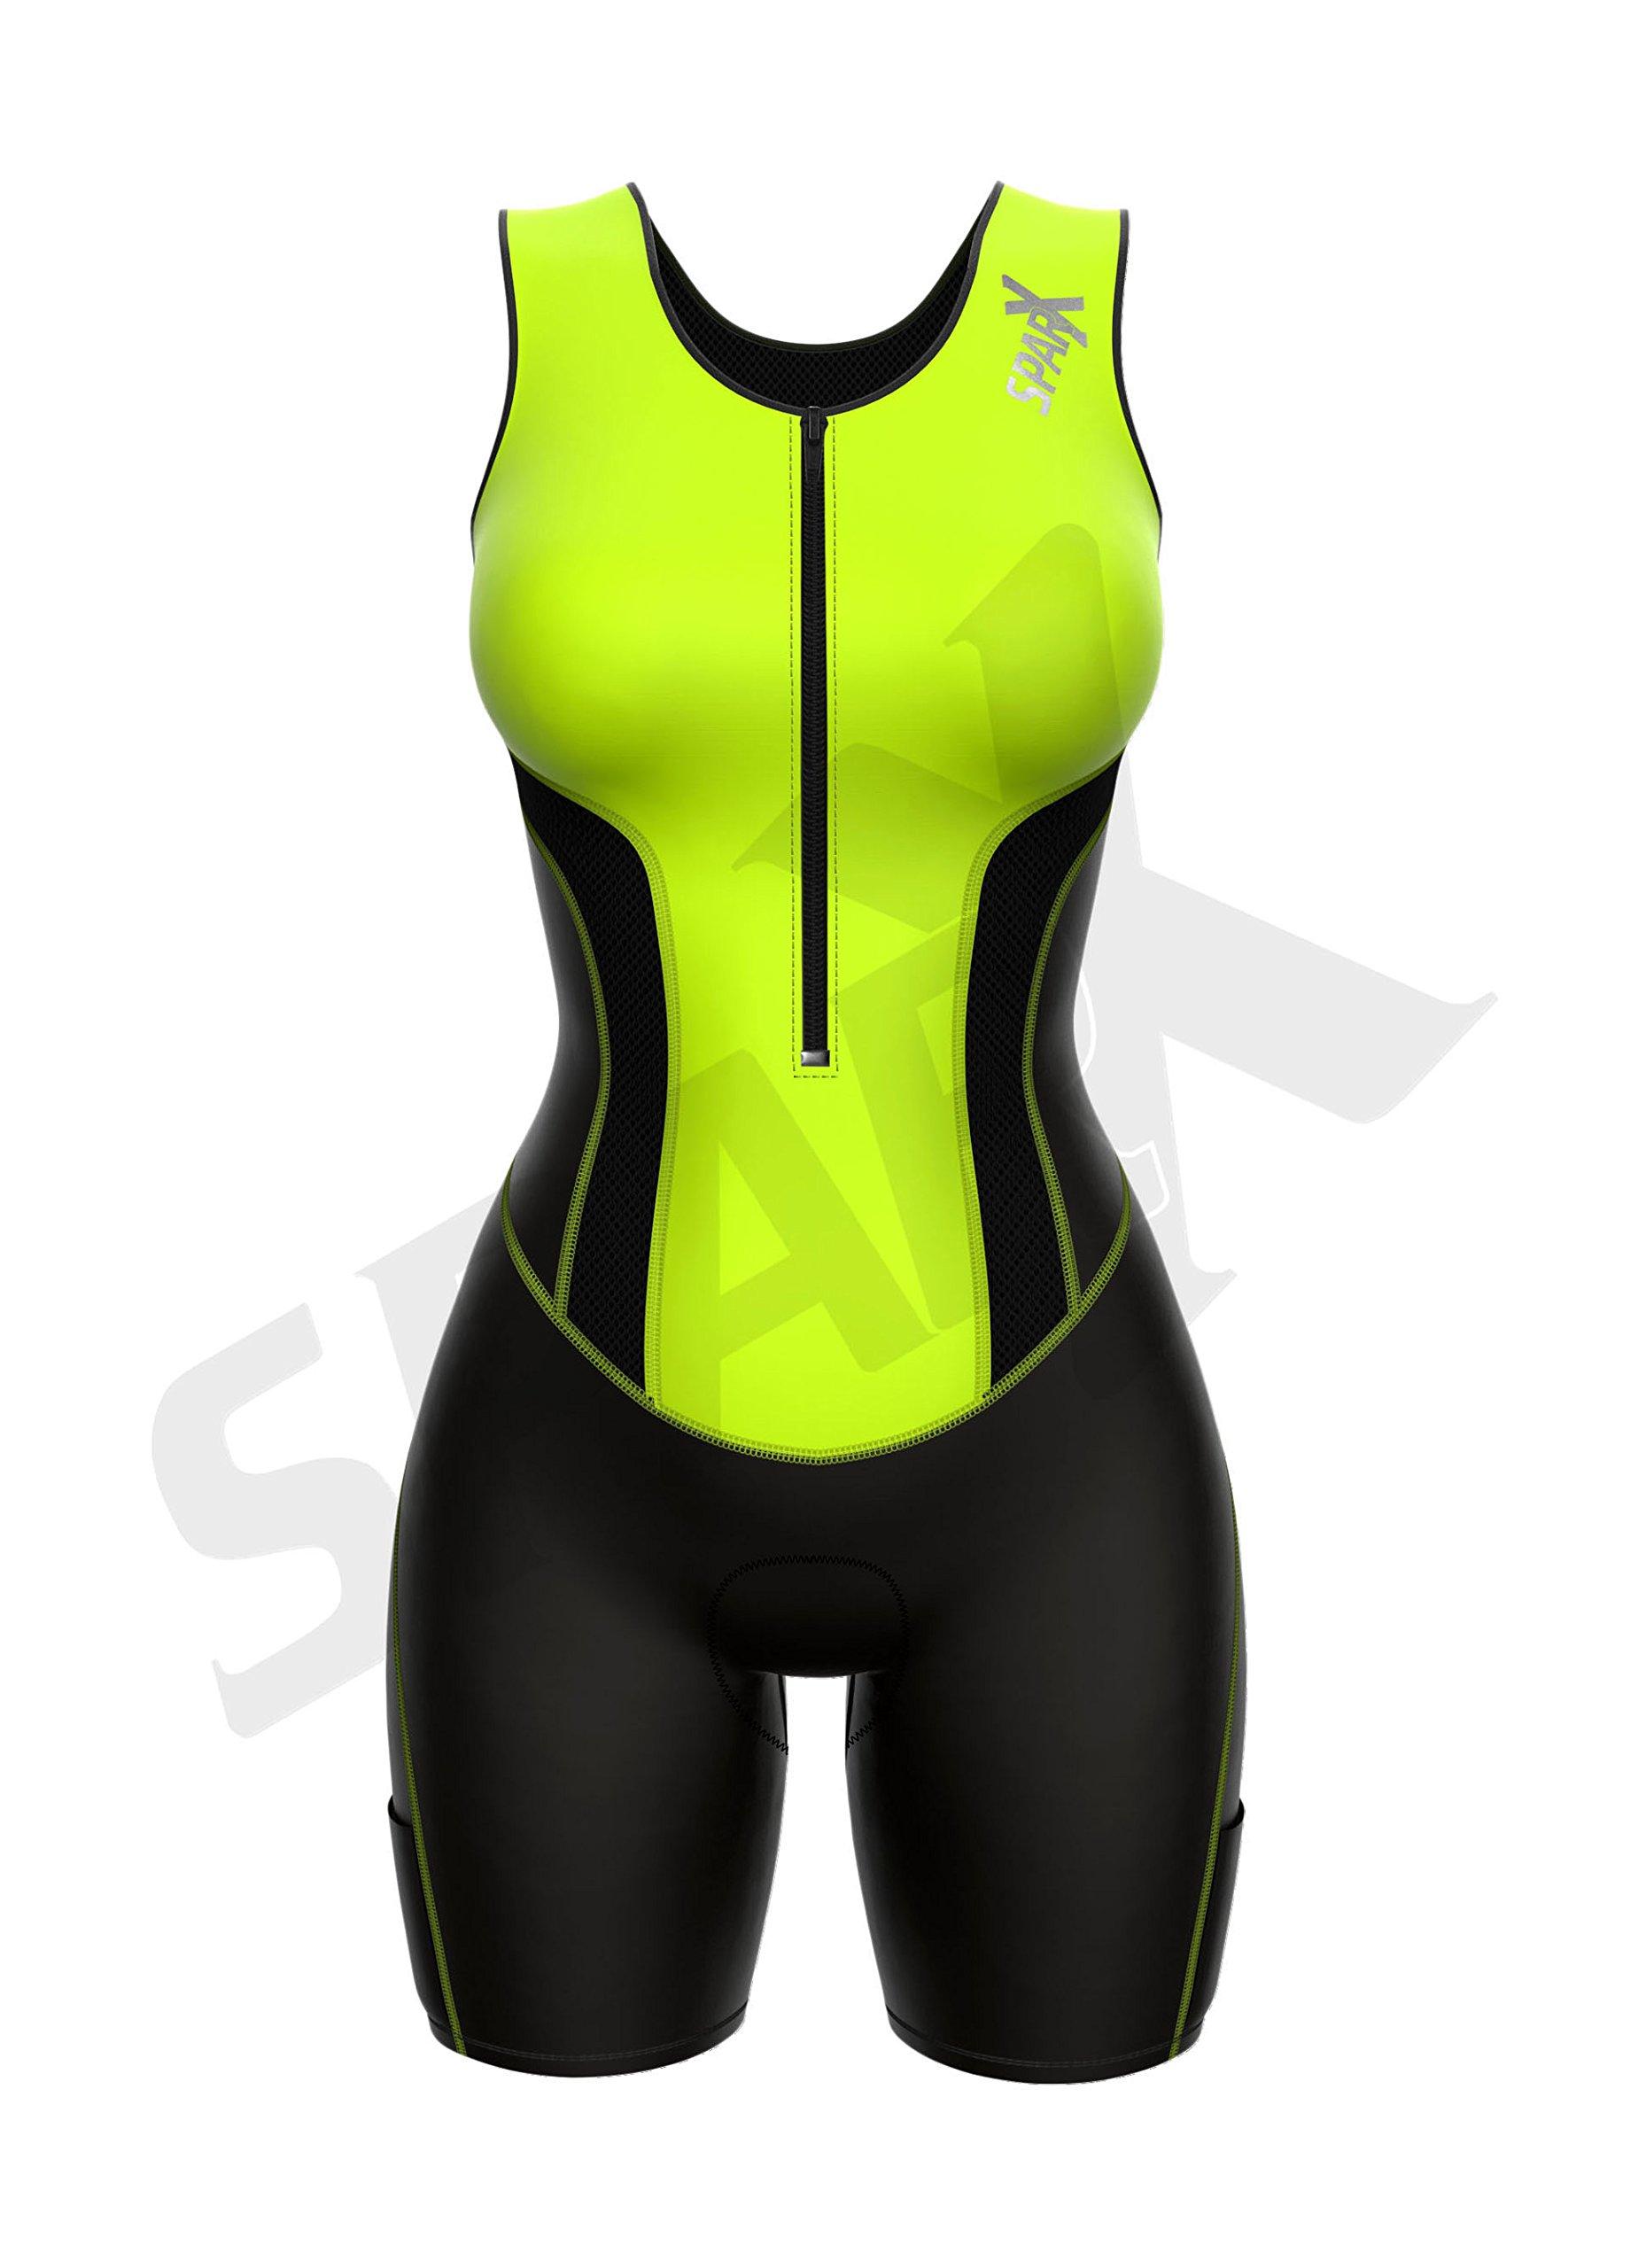 Sparx Women Triathlon Suit Tri Short Racing Cycling Swim Run (Small, Neon Green) by Sparx Sports (Image #2)